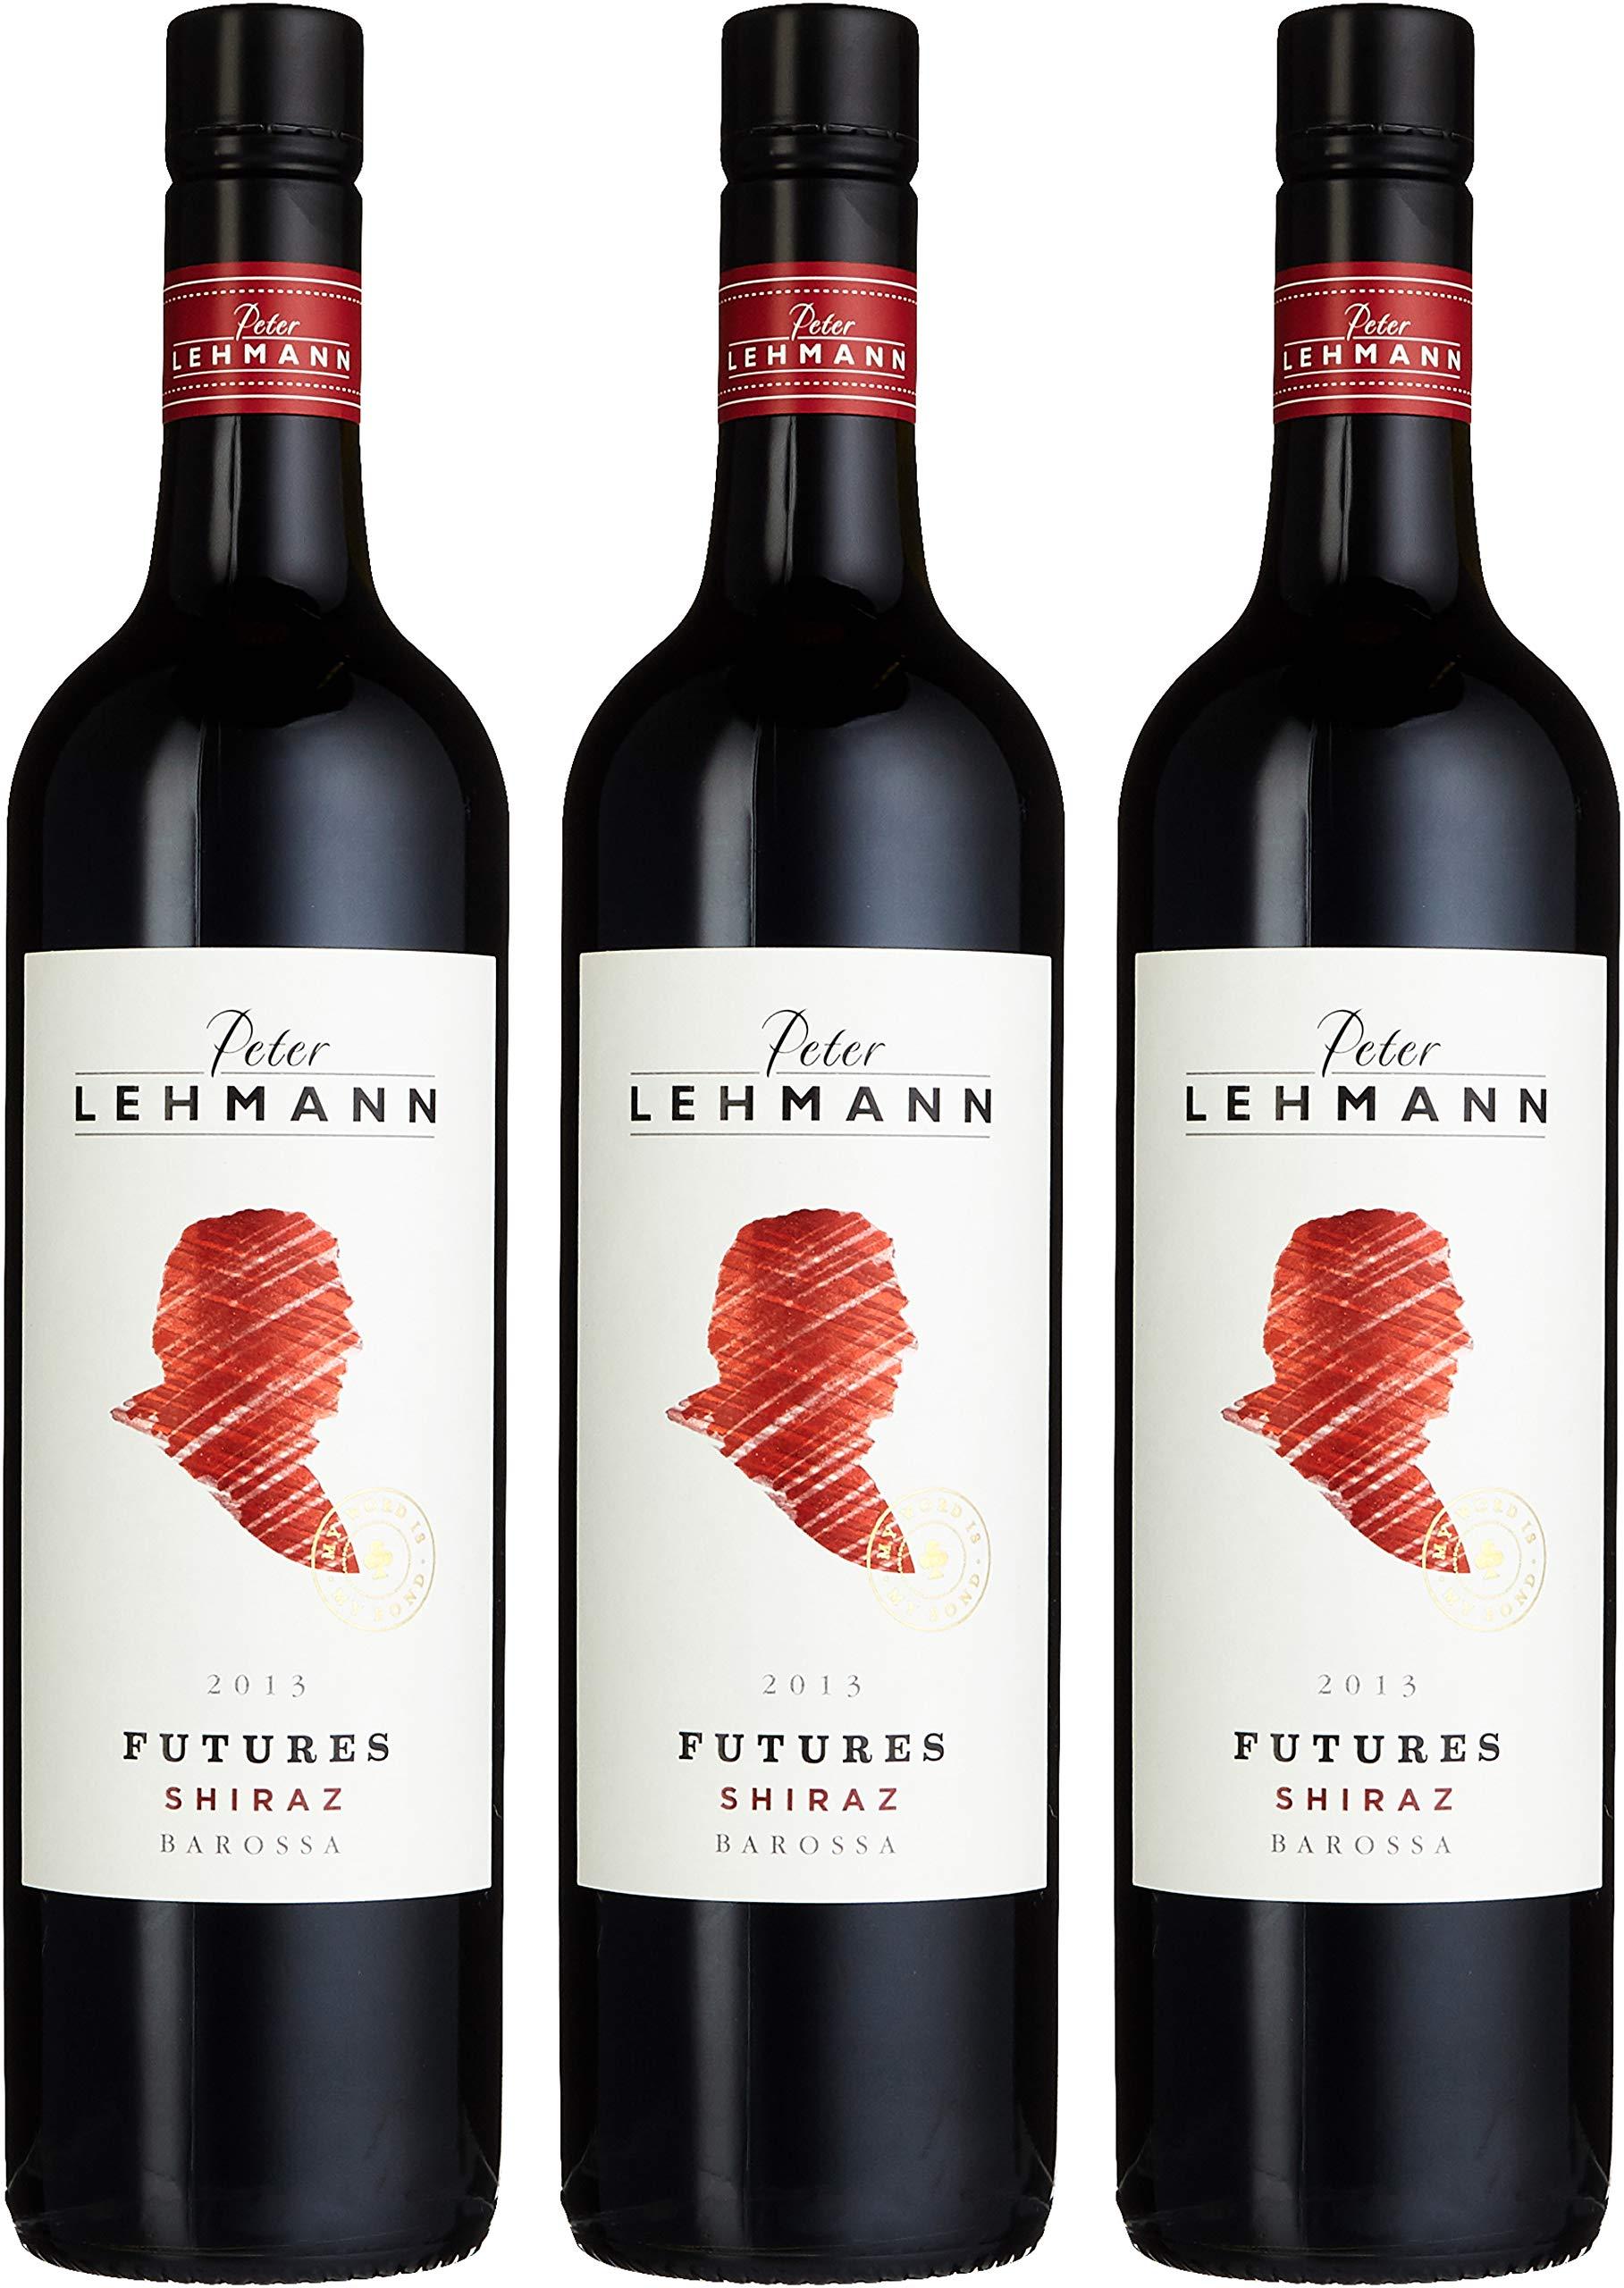 Peter-Lehman-The-Futures-Shiraz-Barossa-Valley-20122013-3-x-075-l